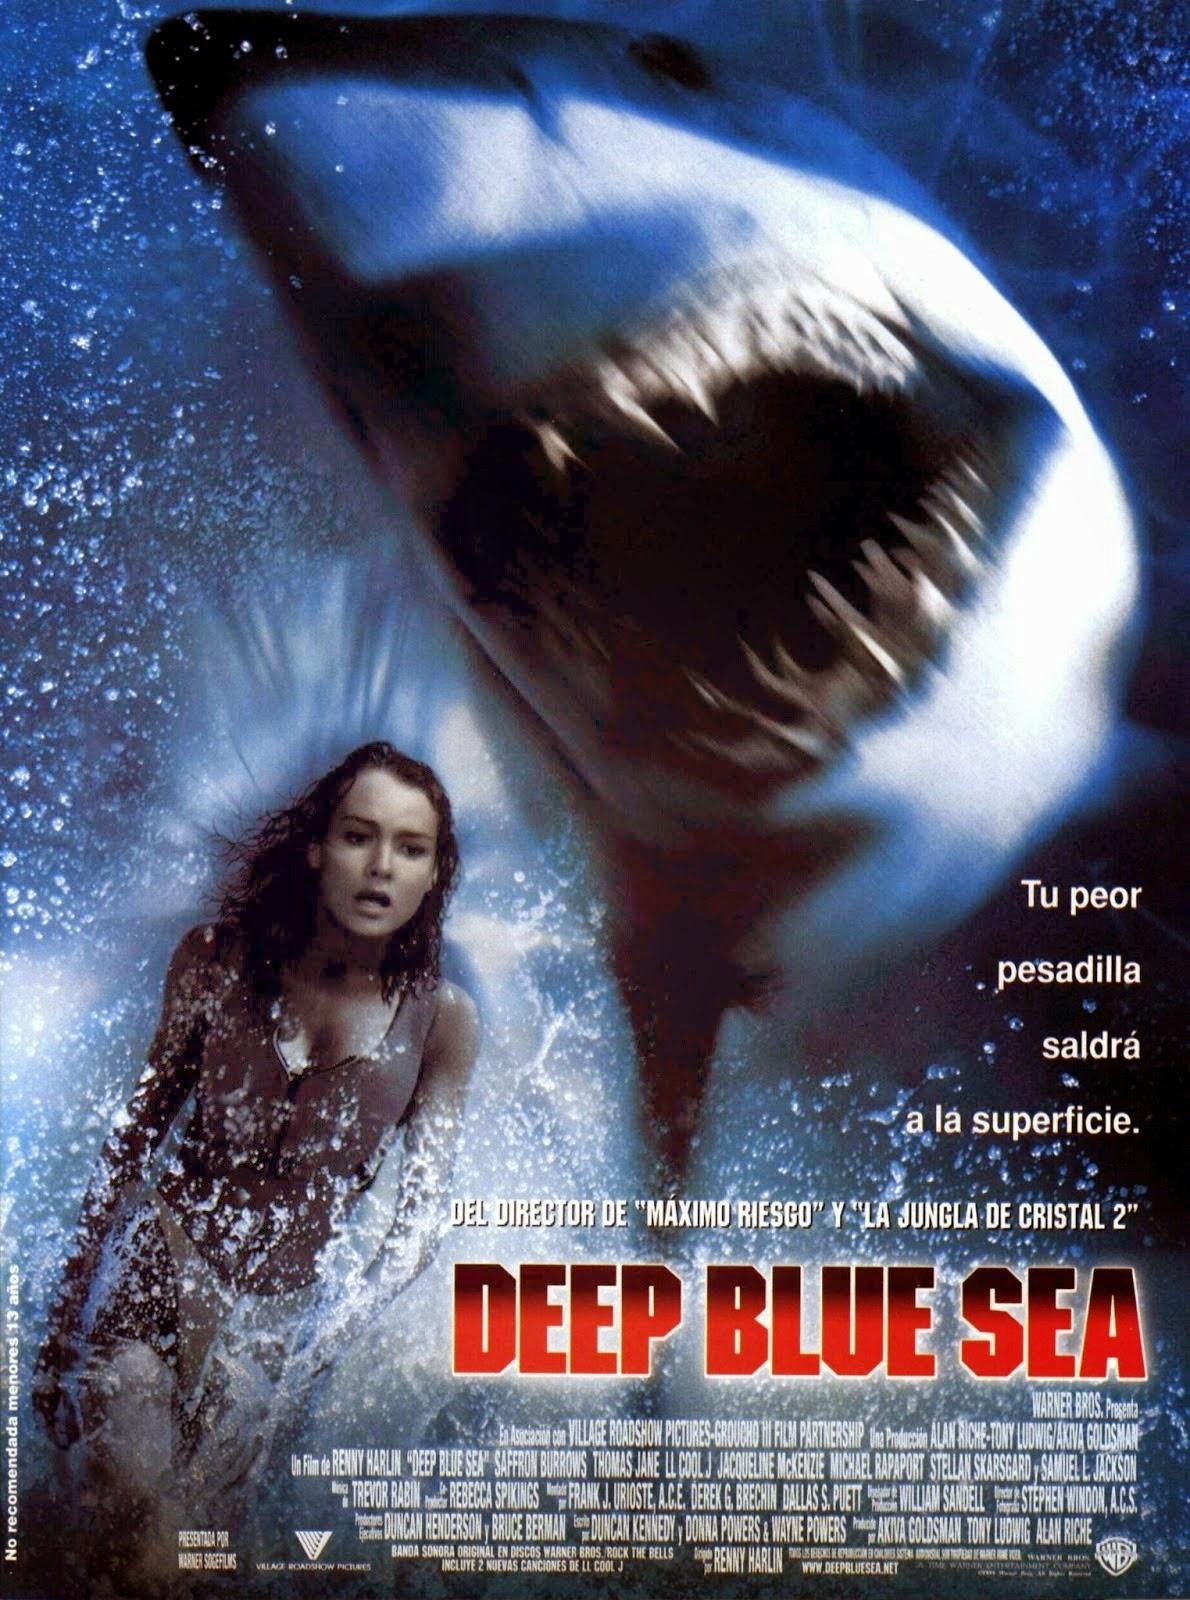 Deep Blue Sea ฝูงมฤตยูใต้สมุทร [HD][พากย์ไทย]